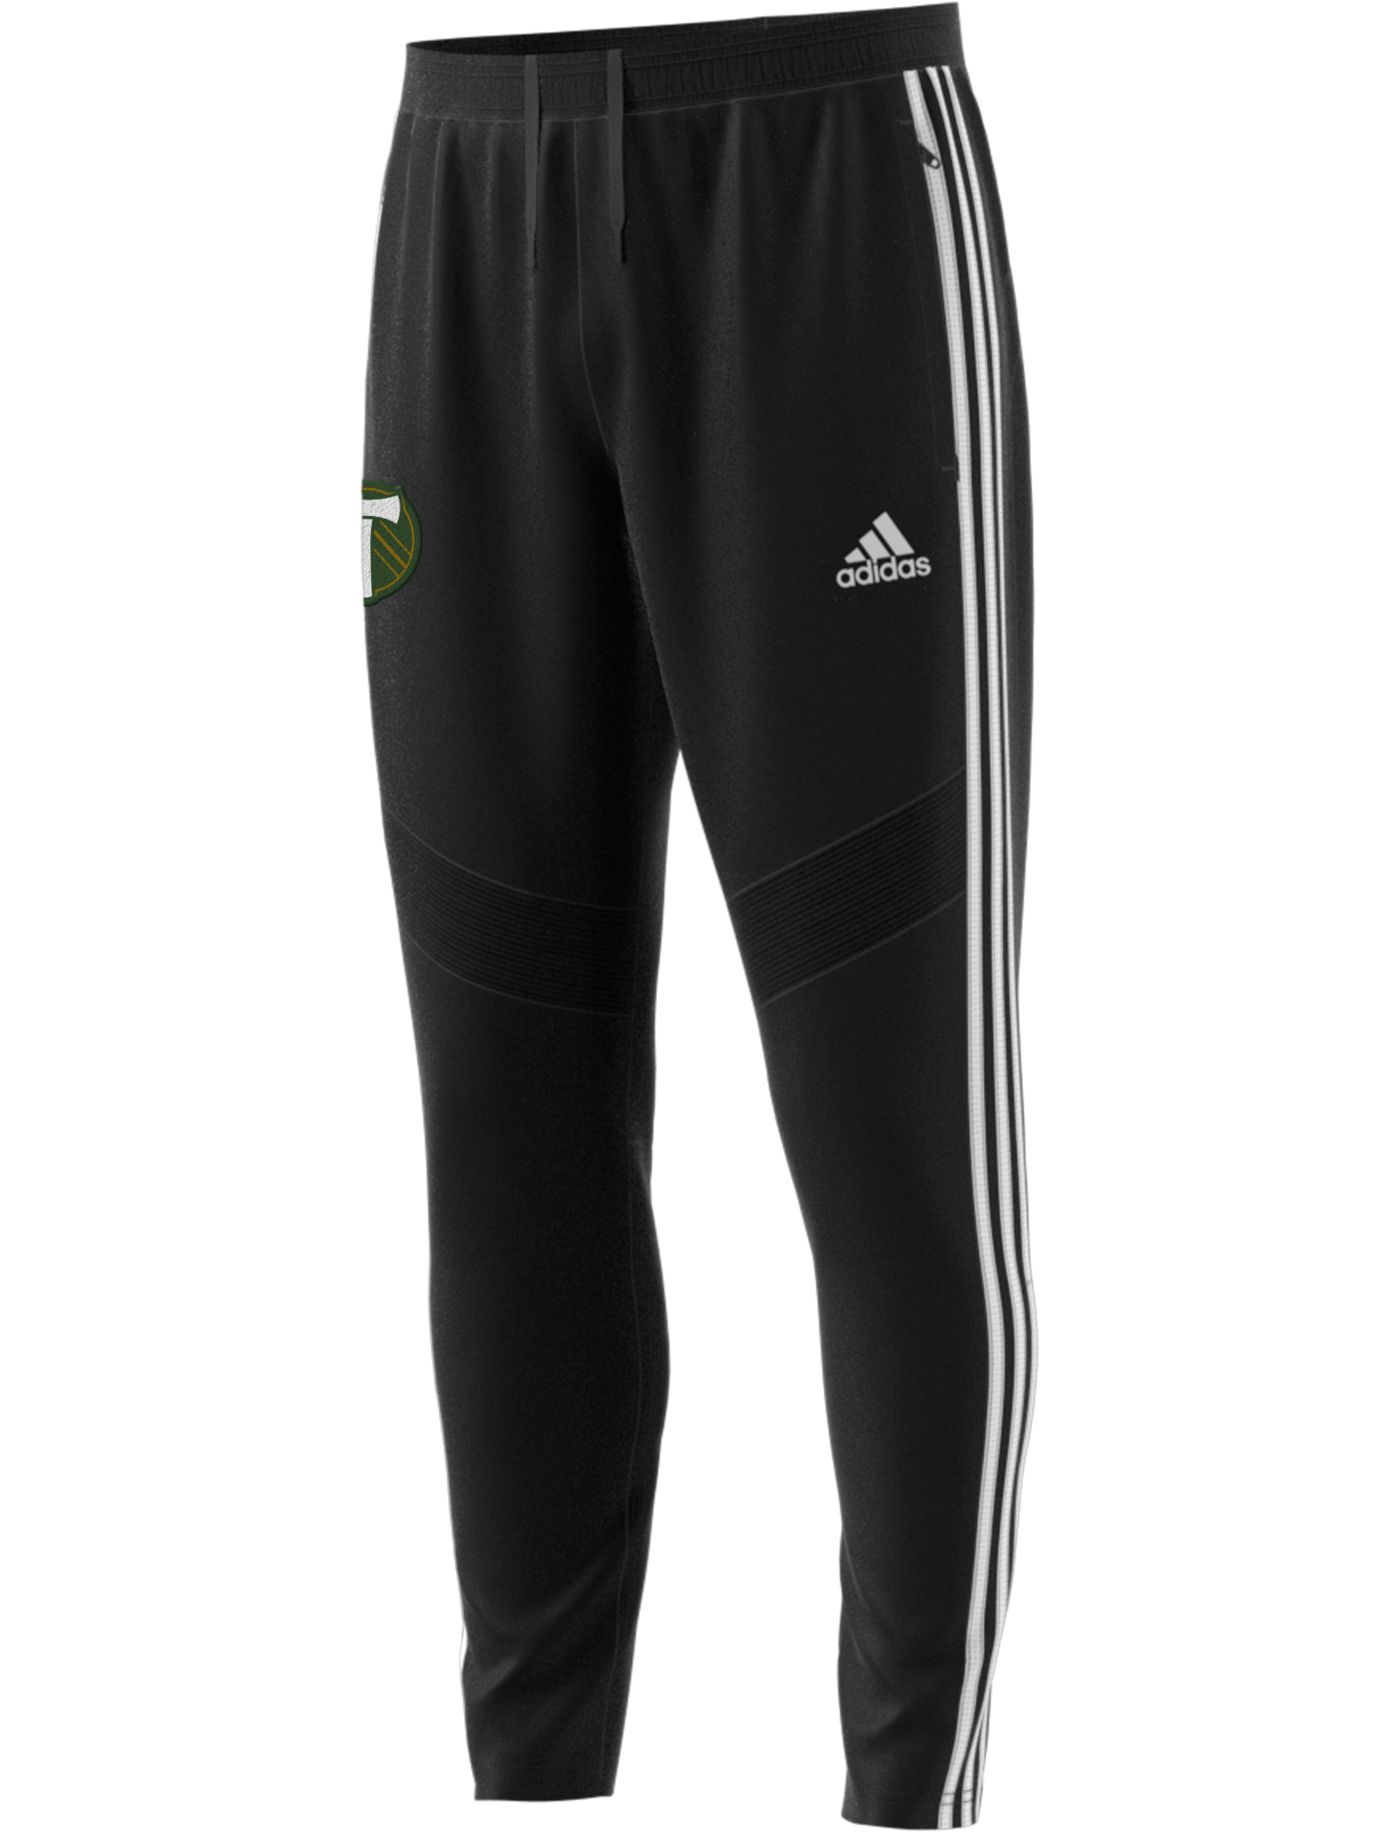 adidas Men's Portland Timbers Tiro Black Pants